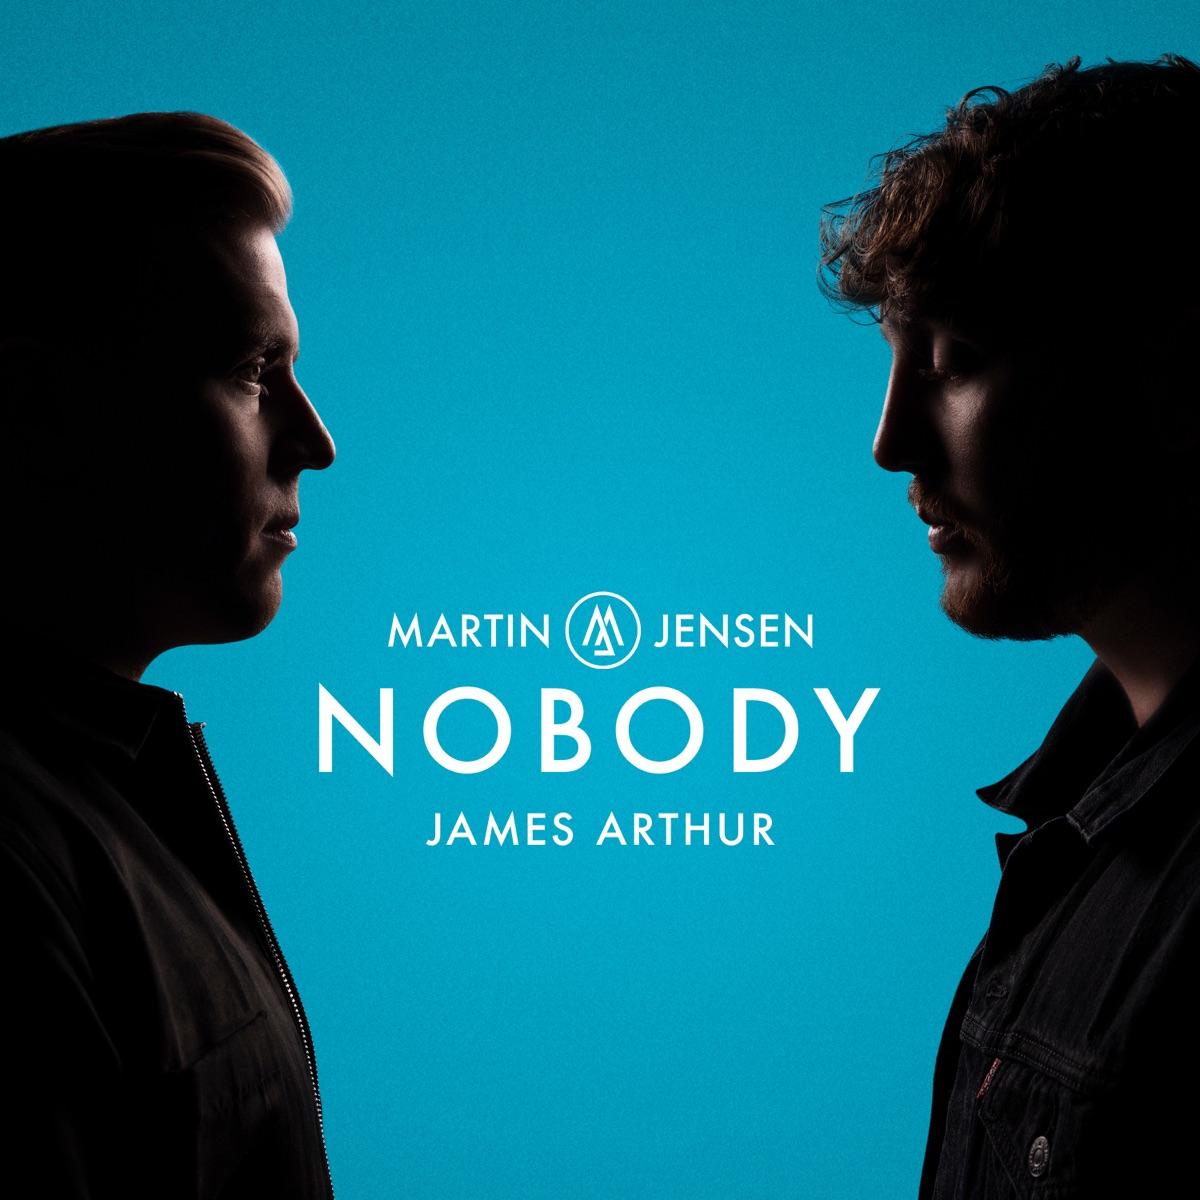 Nobody - Single Album Cover by Martin Jensen & James Arthur